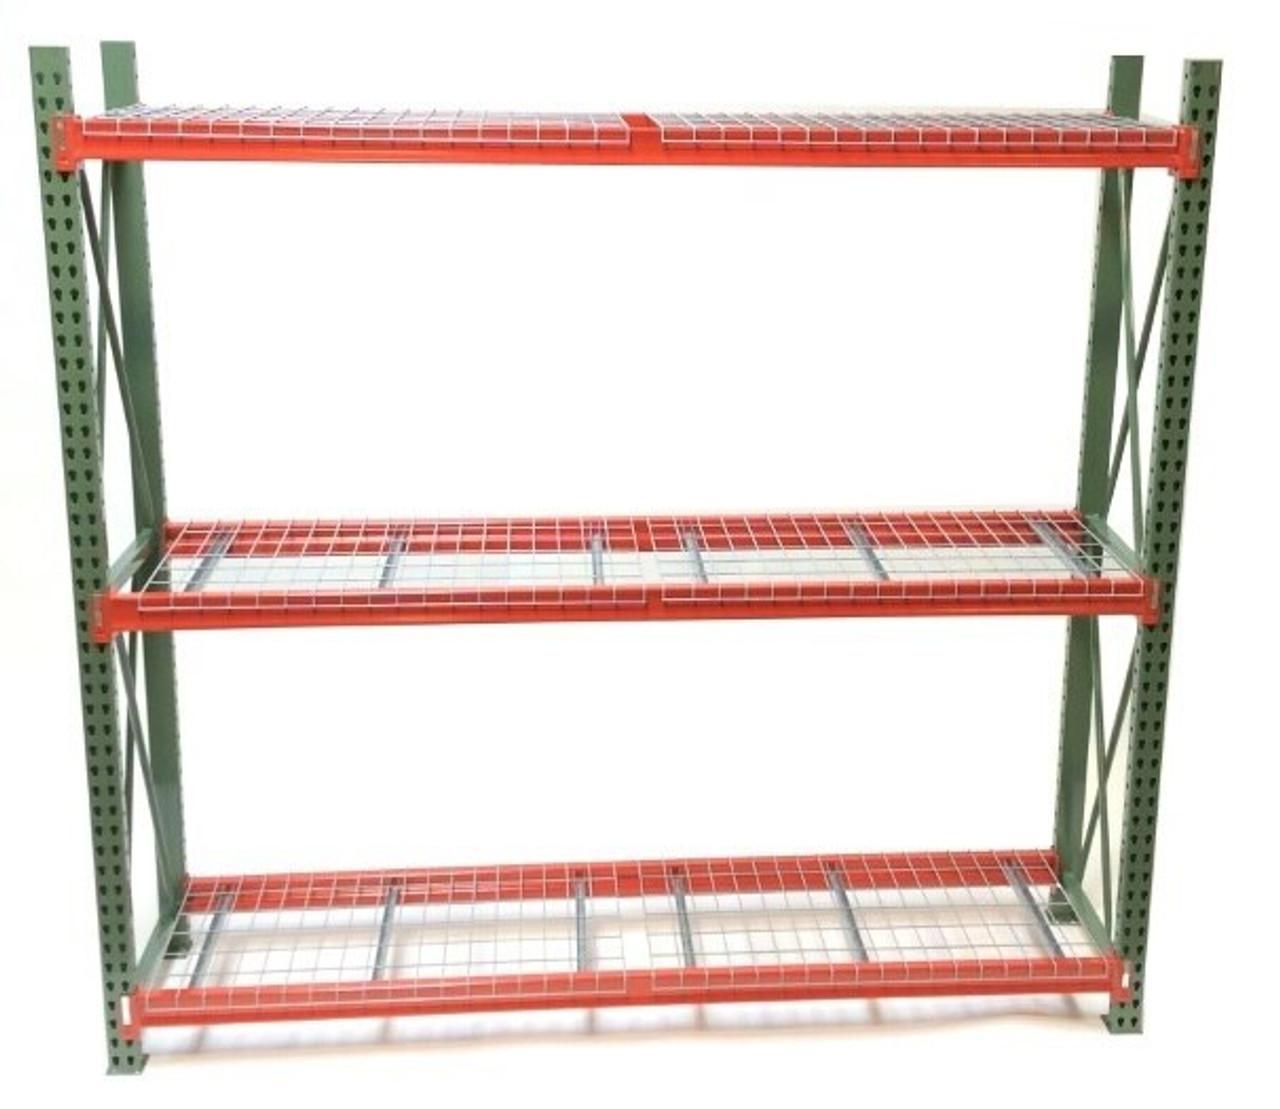 pallet rack starter unit 96 wx24 dx96 h